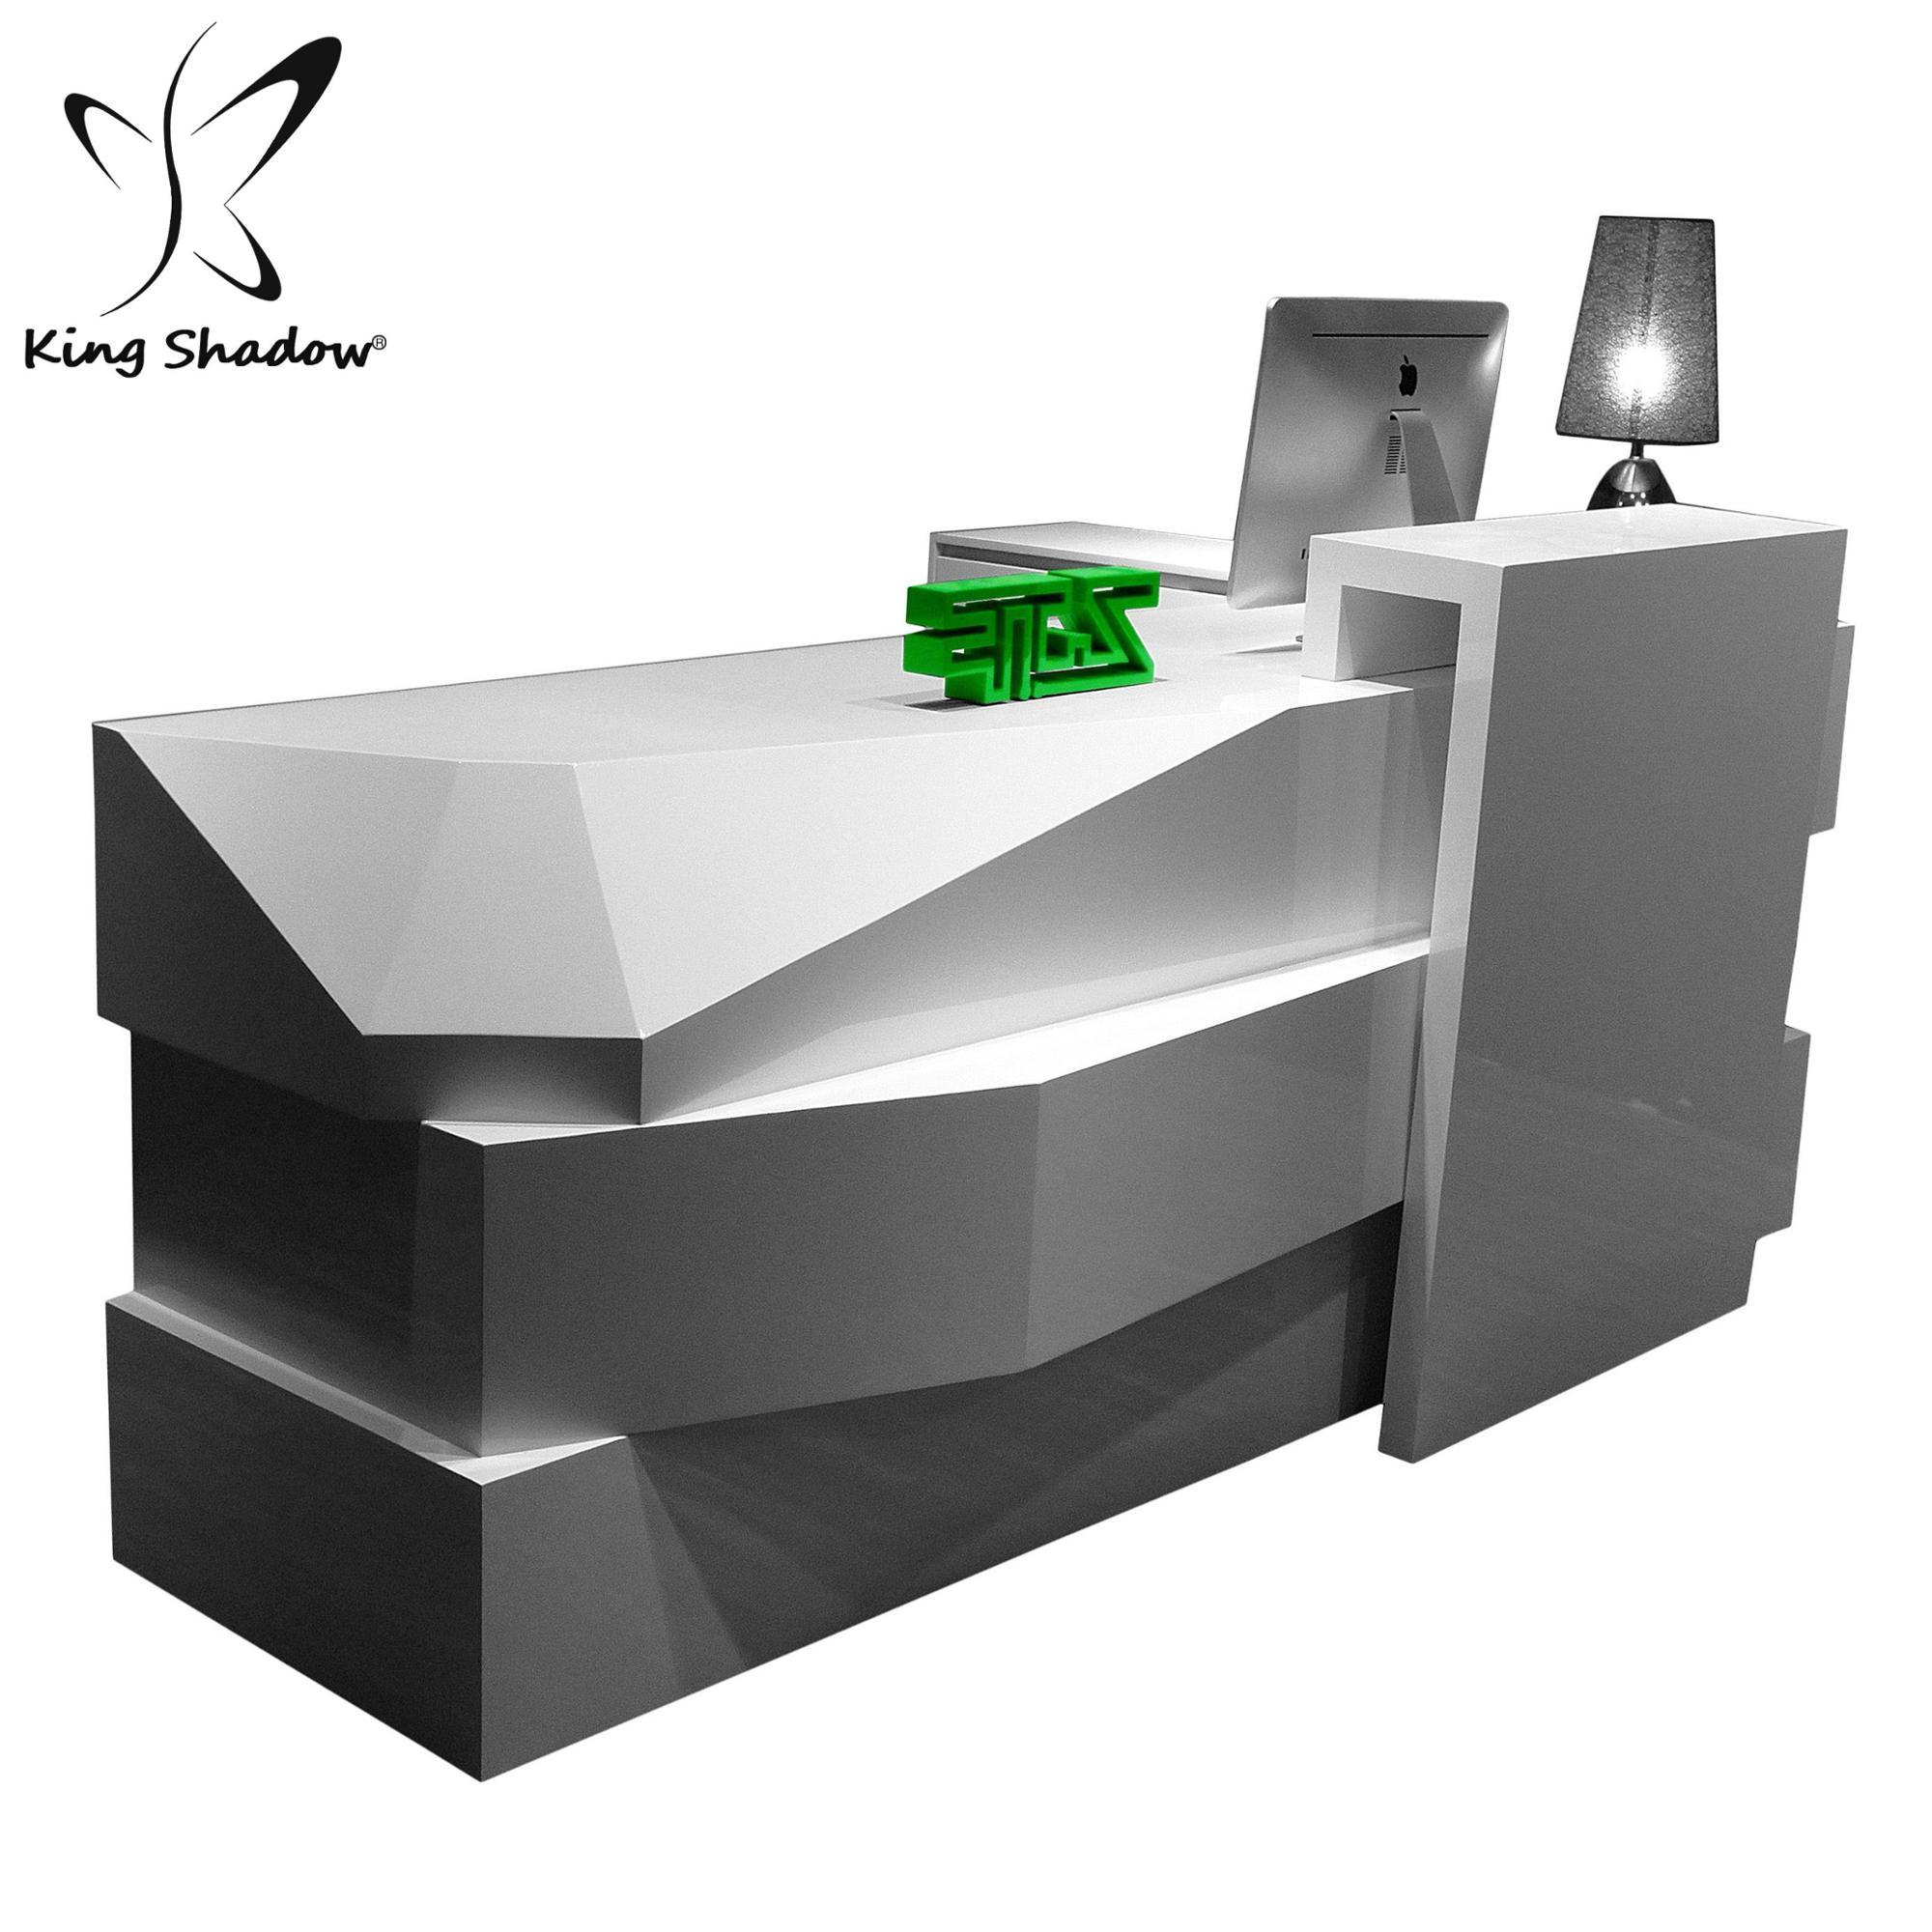 jesanet for salon frontdesk all reception front endearing natural com products desk recent